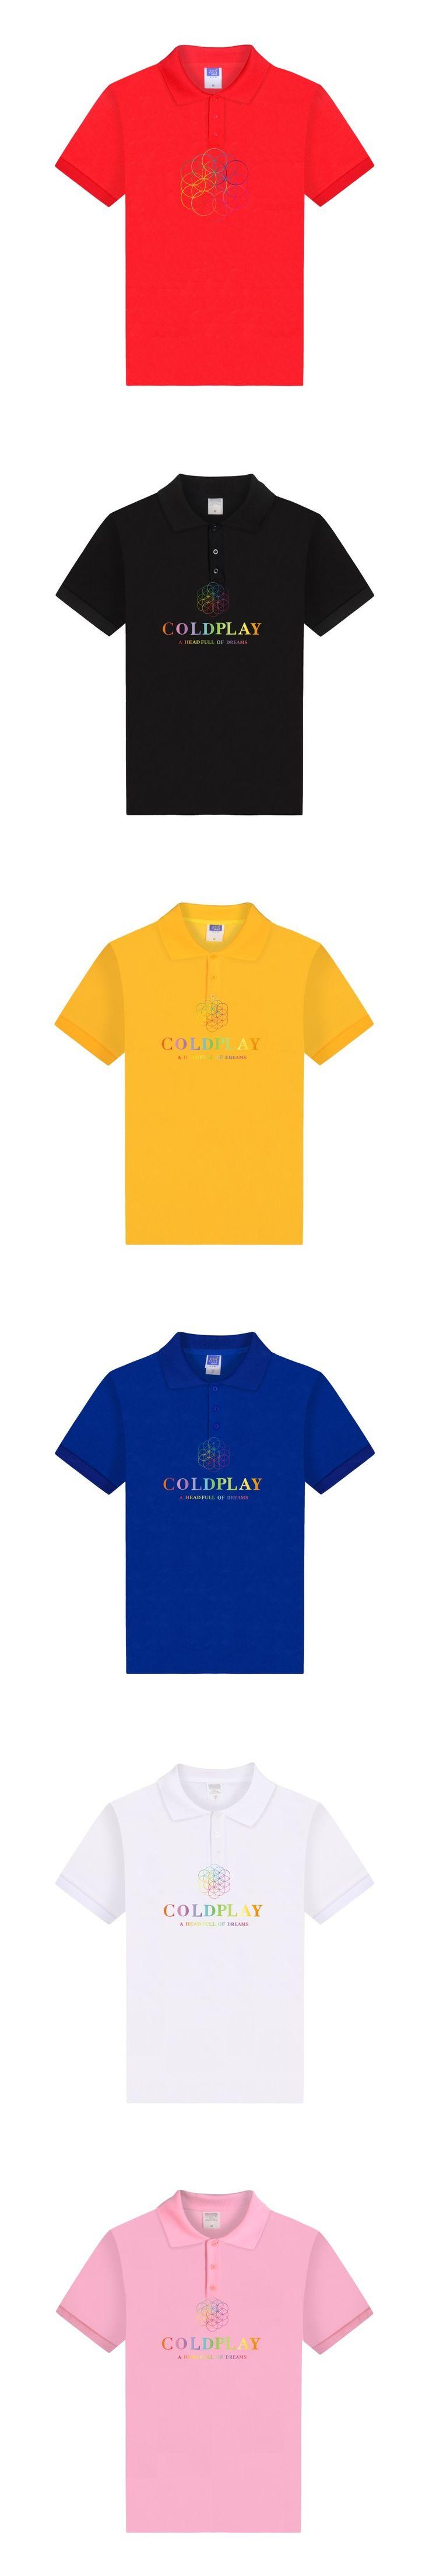 ALIZAZA Coldplay Polo Shirt Men Short Sleeve World Tour Dates 2017 Black White Polo Brand Metal Rock Tee Hip Hop Male Clothing